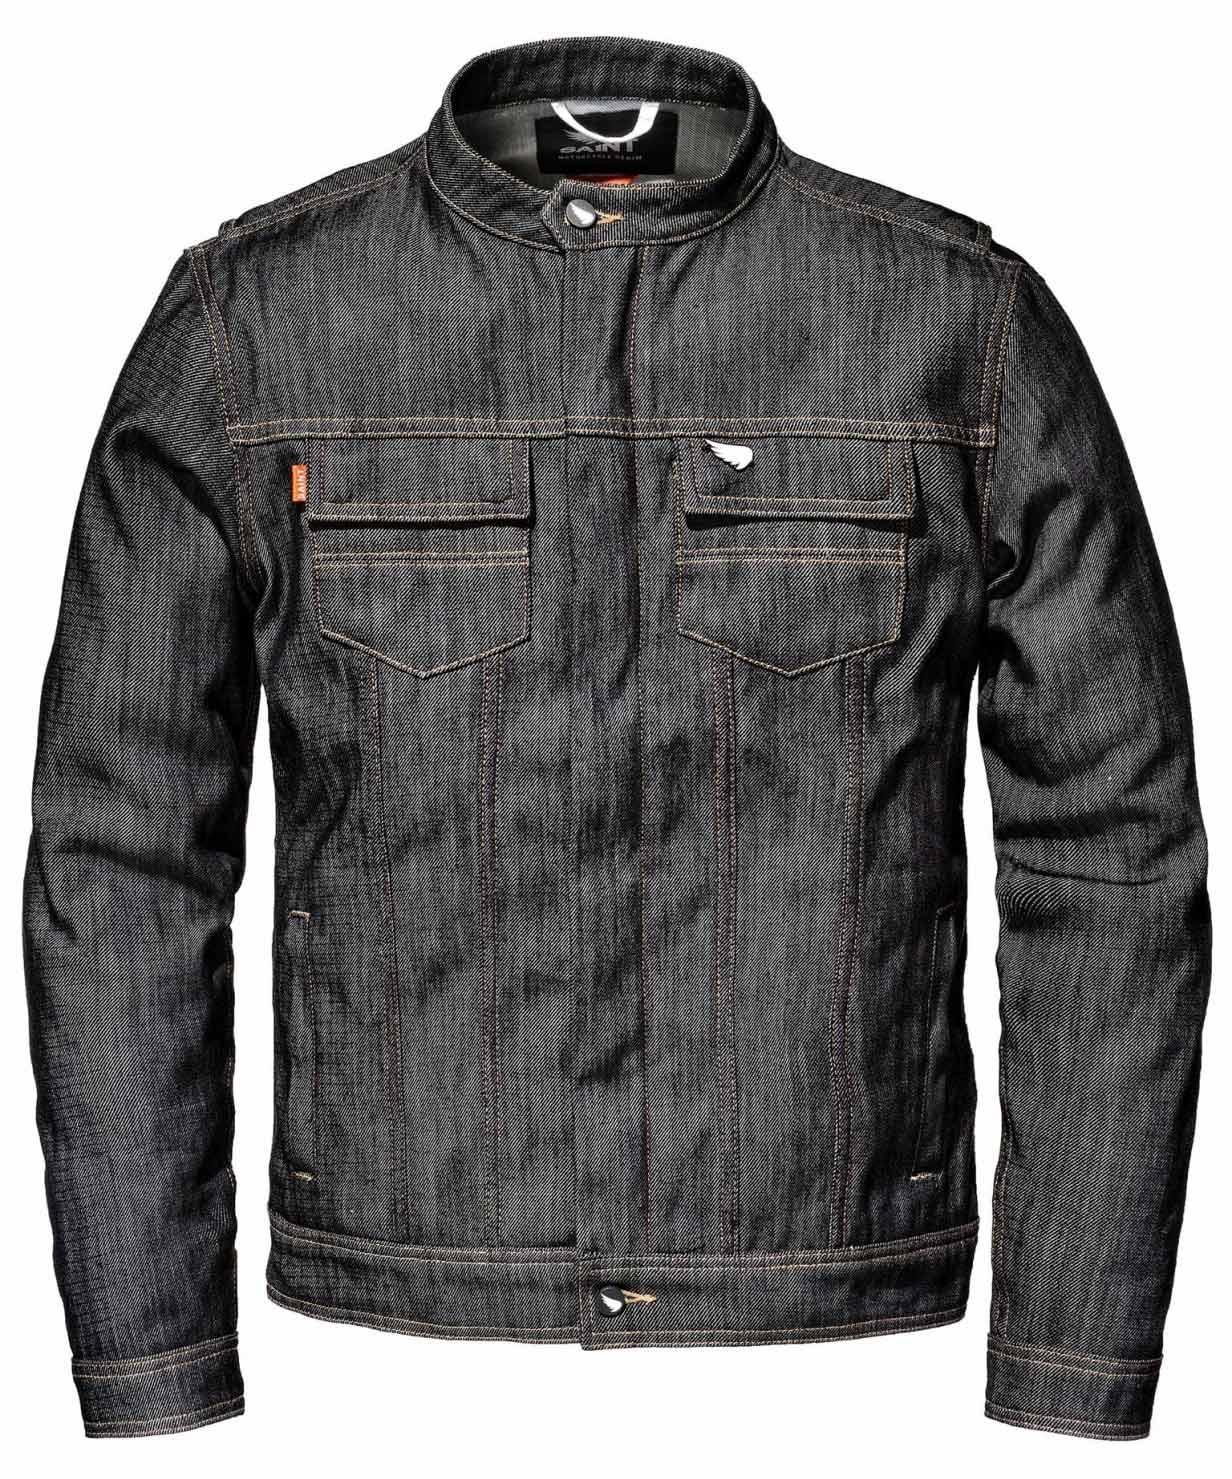 Saint Unbreakable Technical Denim Jacket